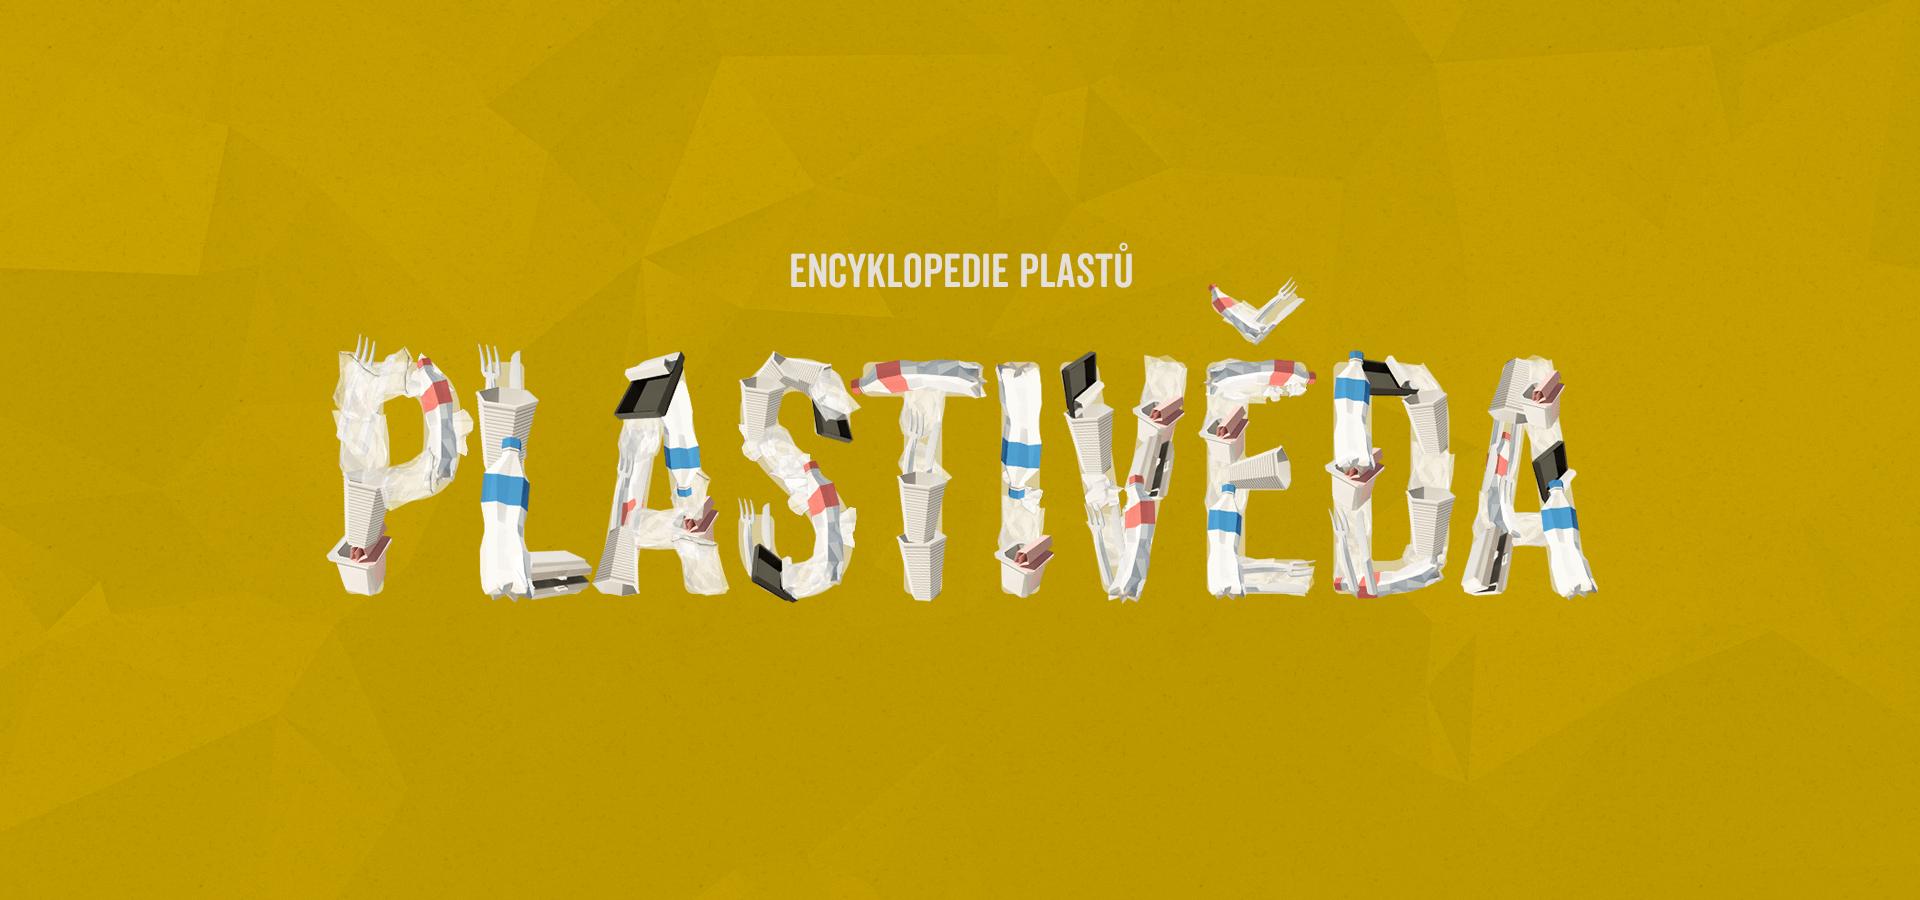 samosebou_plastiveda_encyklopedie_plastu_plast